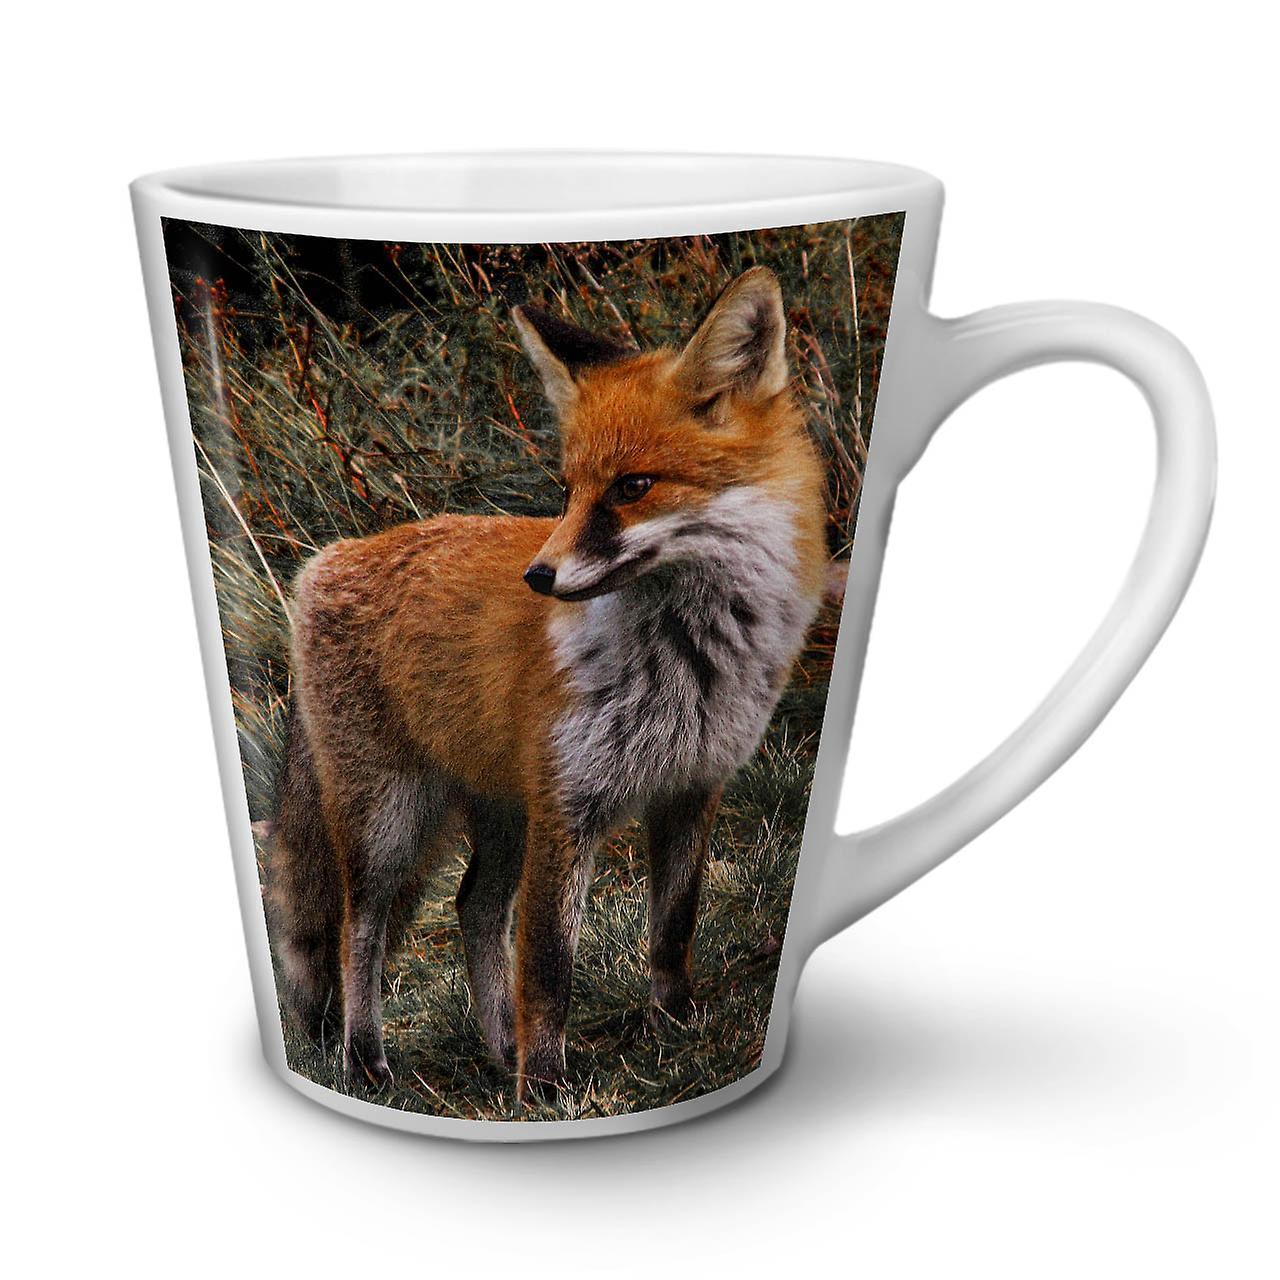 Hunter En Fox Thé Café OzWellcoda Blanc Flaming 12 Céramique Mug Nouveau Latte ONvnw0m8